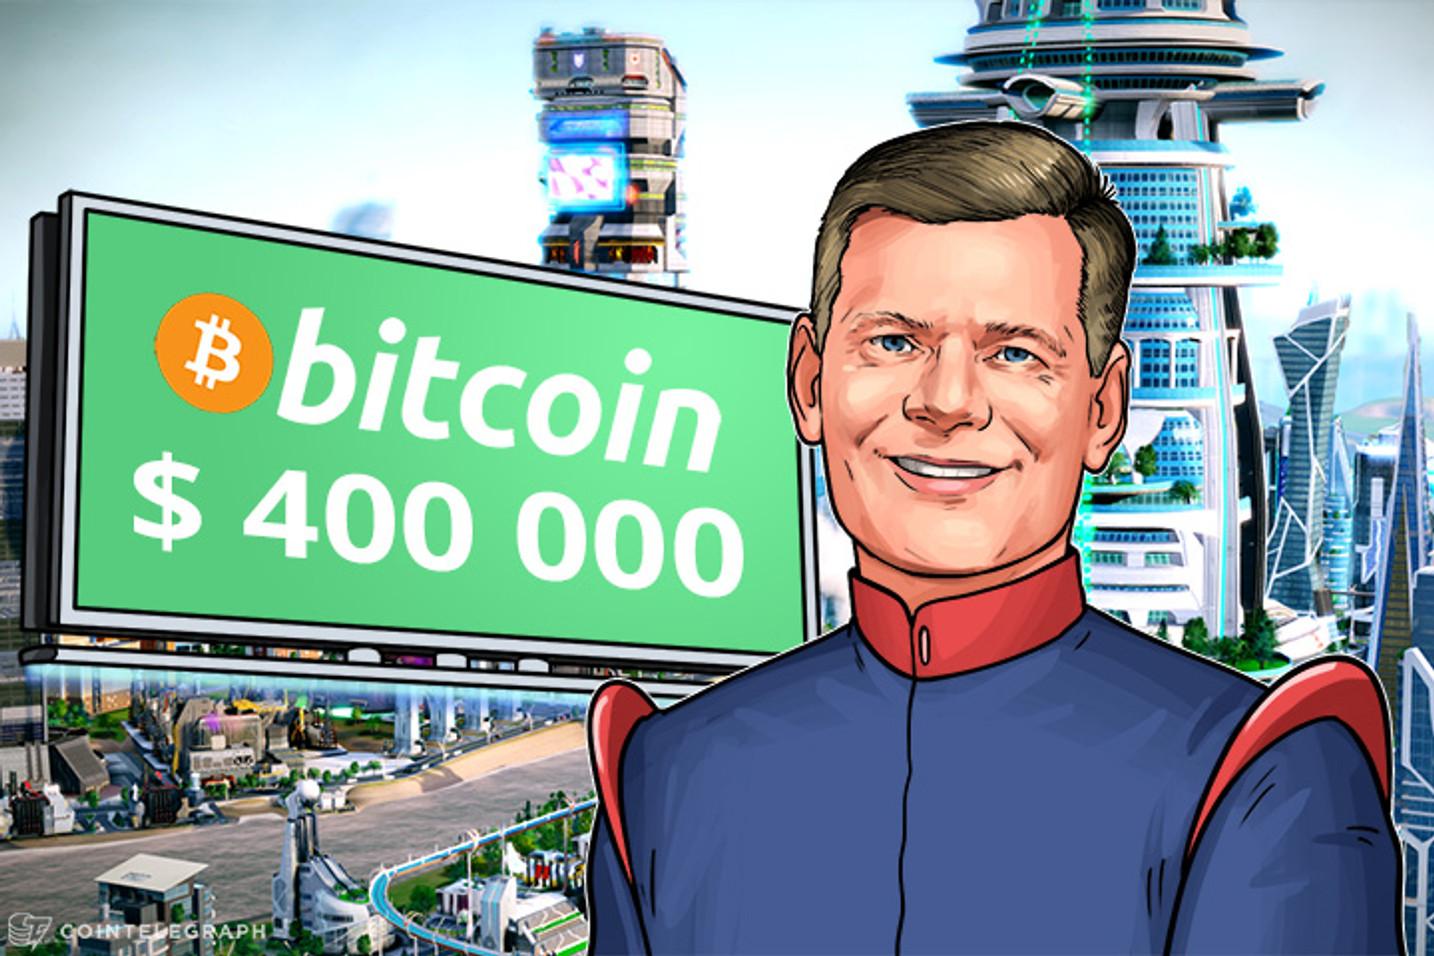 Bitcoin valdrá $400,000 afirma el gurú inversor Mark Yusko